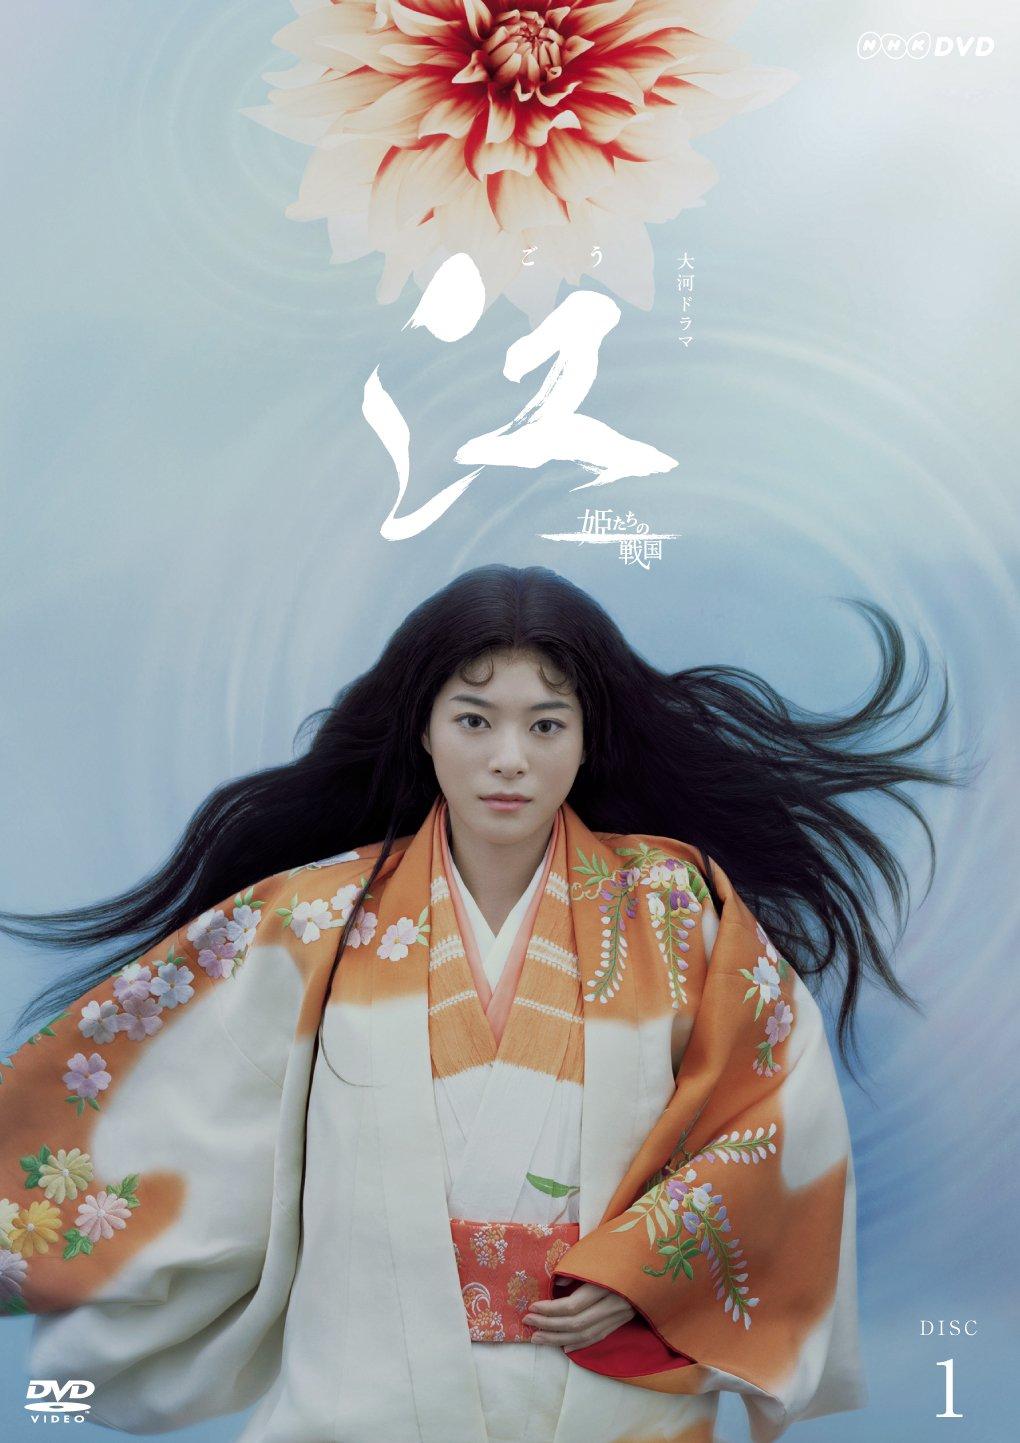 NHK大河ドラマ 江 姫たちの戦国 完全版 Blu-ray BOX 第壱集 B005EQ8JQM